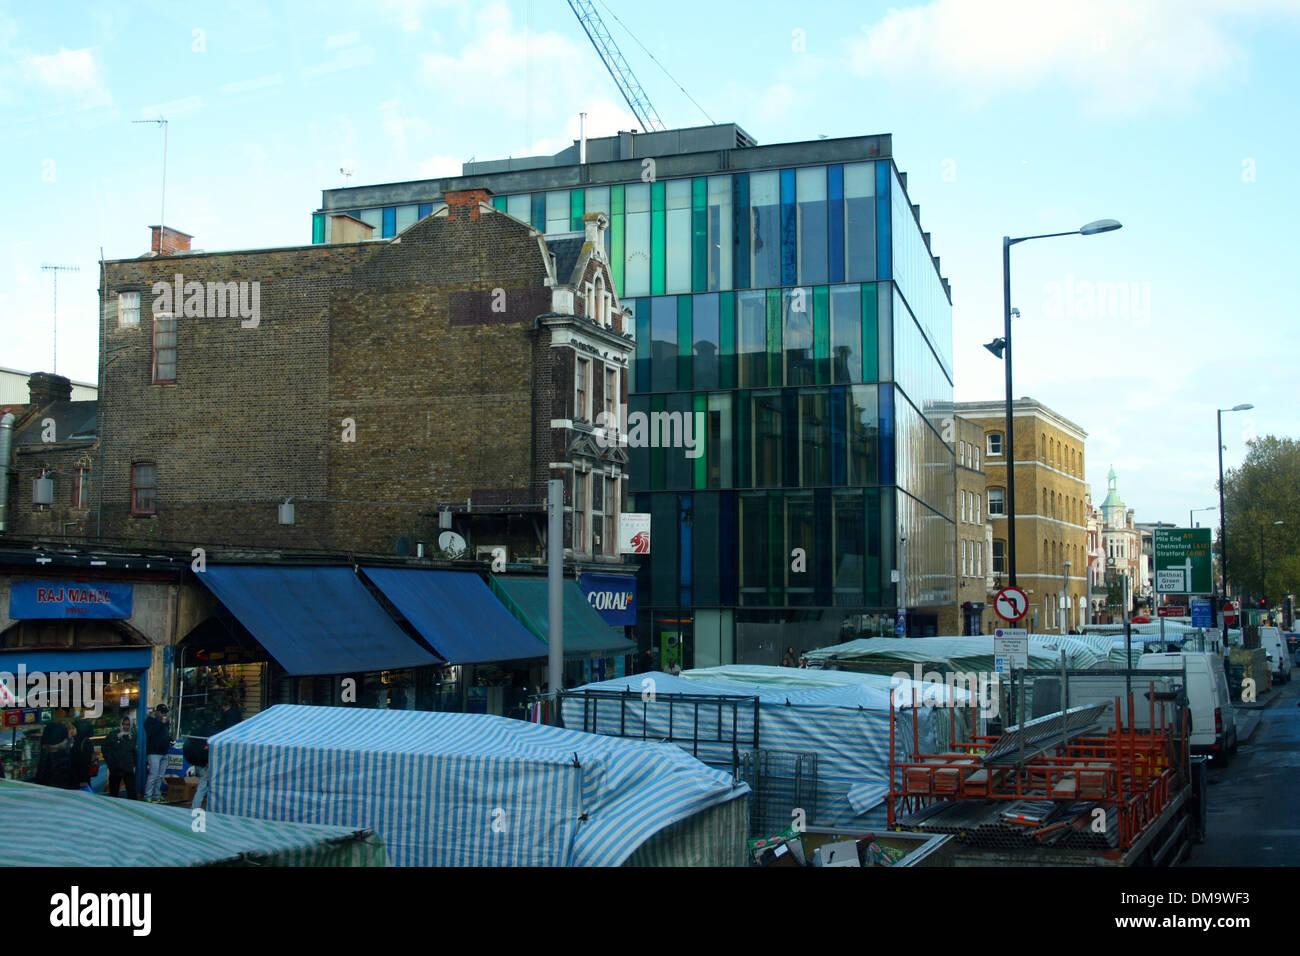 Library / Idea Store in Whitechapel, London - Stock Image